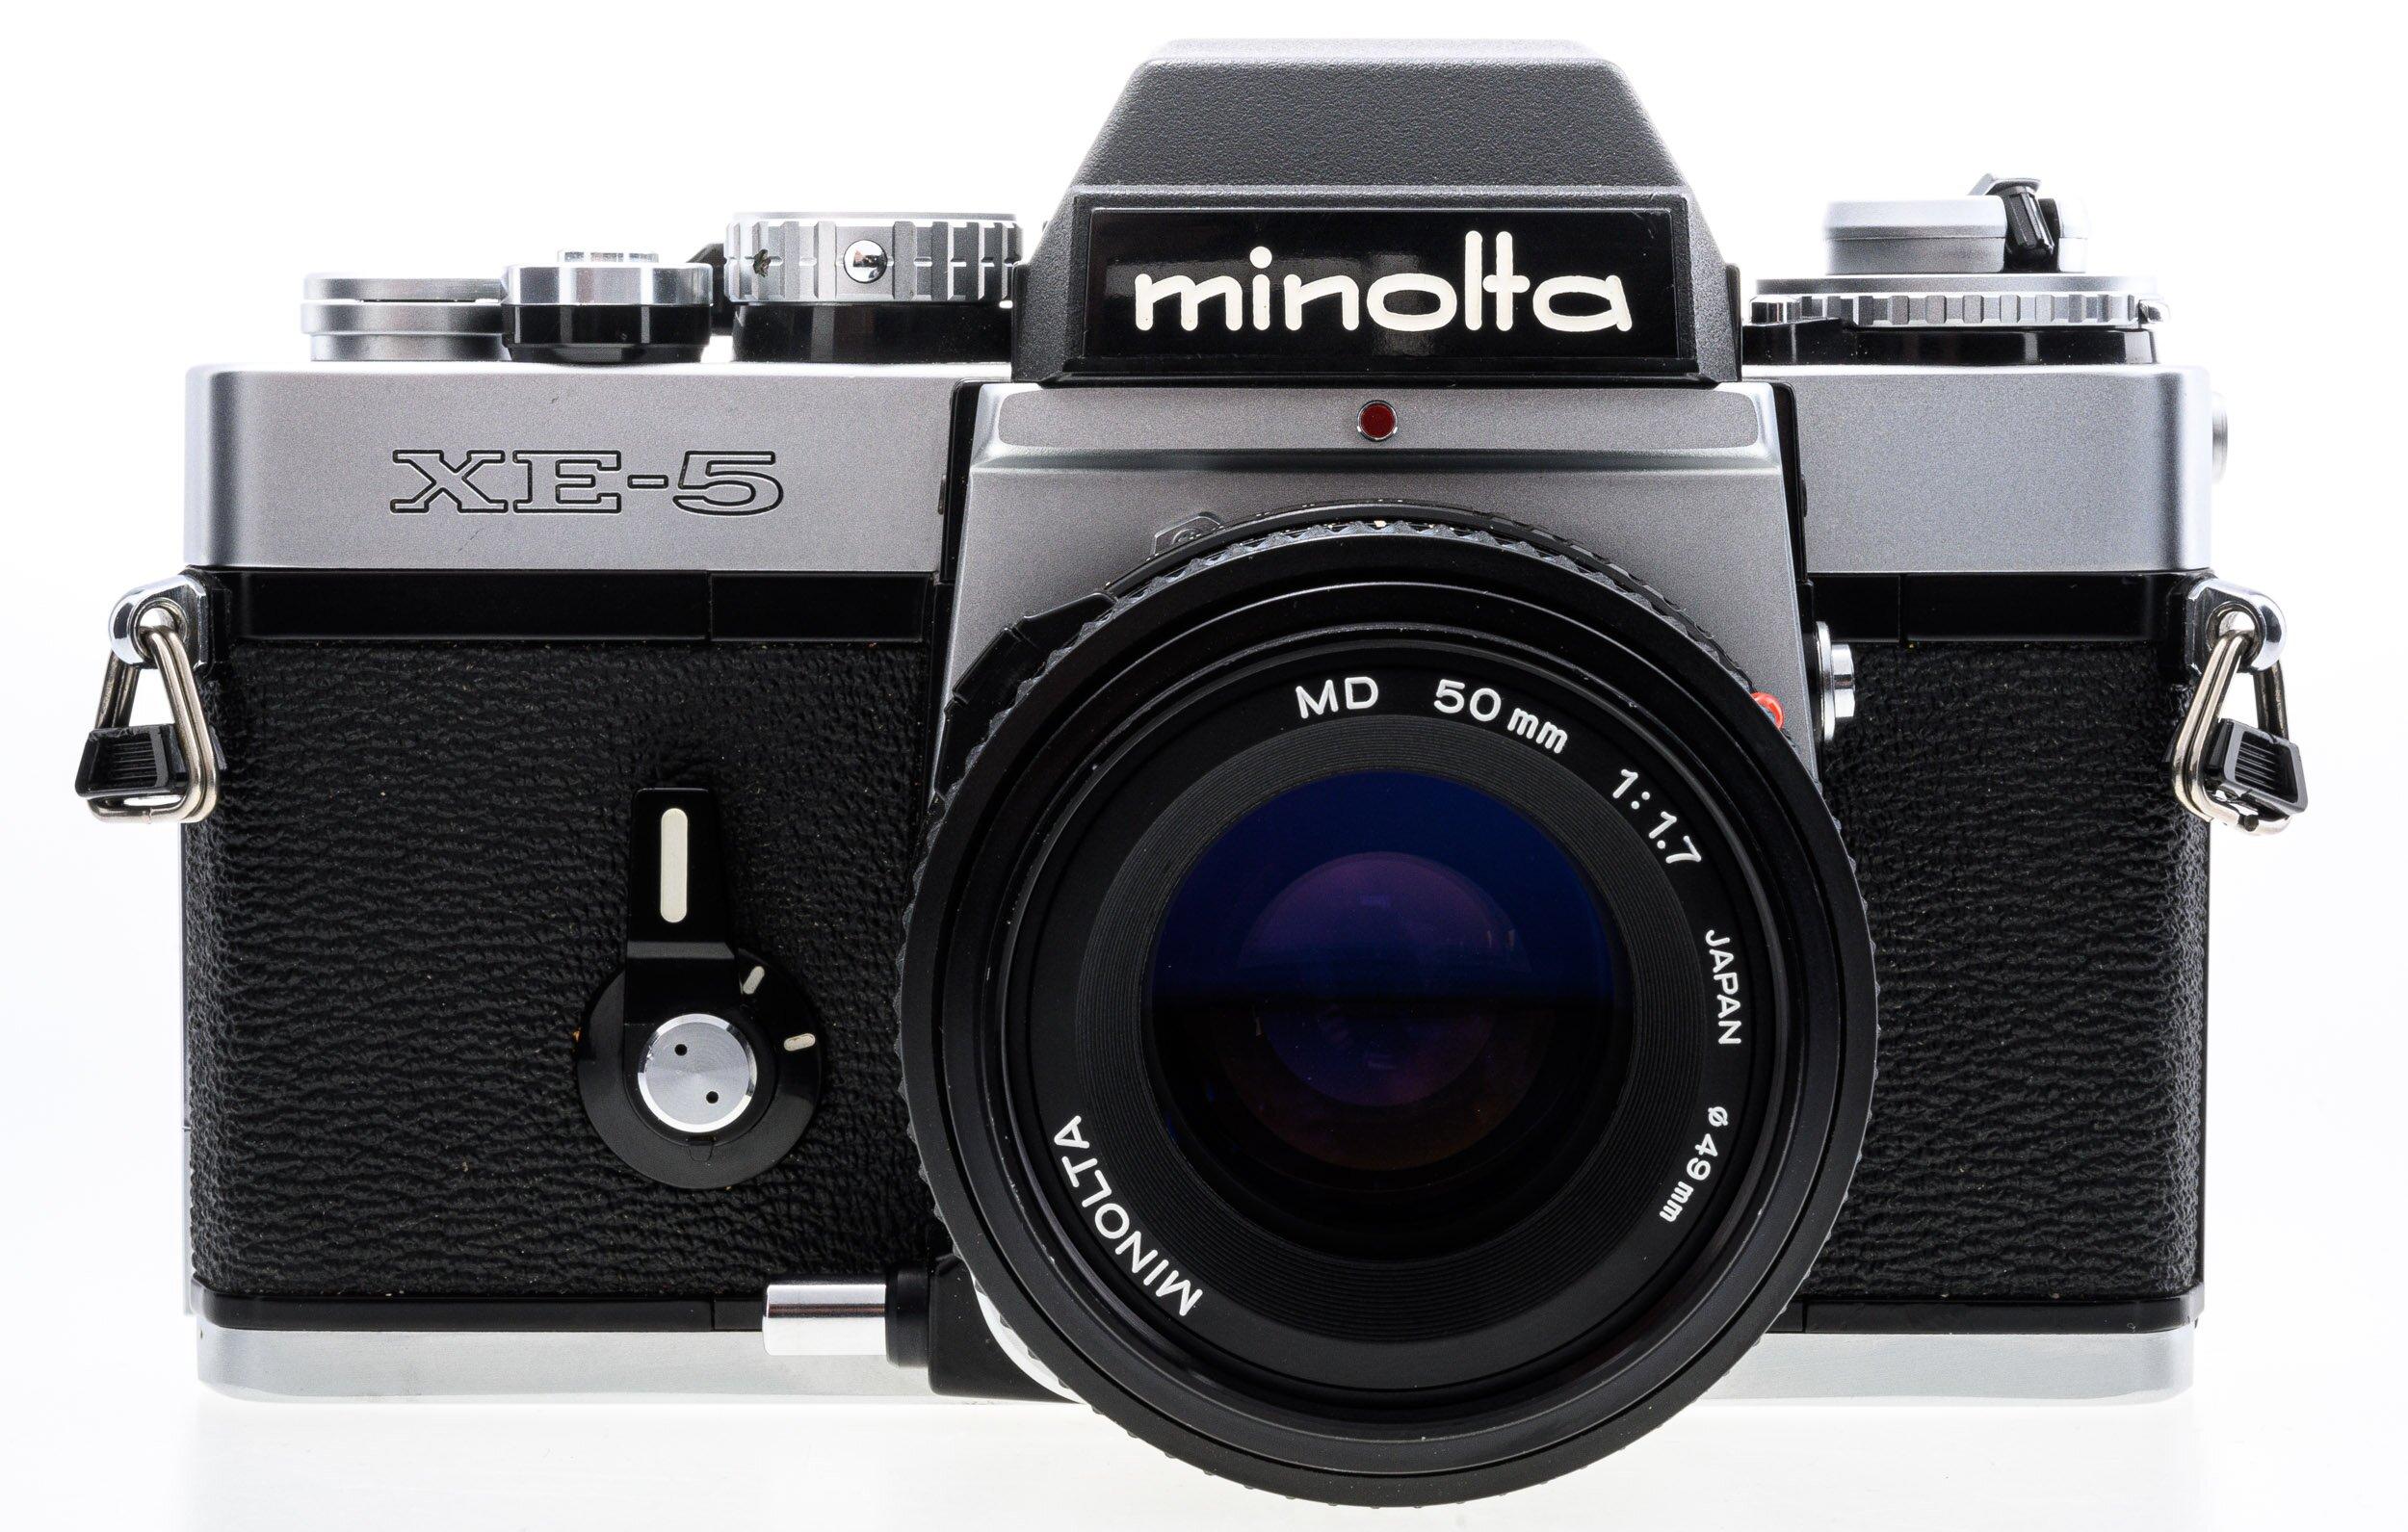 Minolta XE-5 Minolt 1,7/50mm